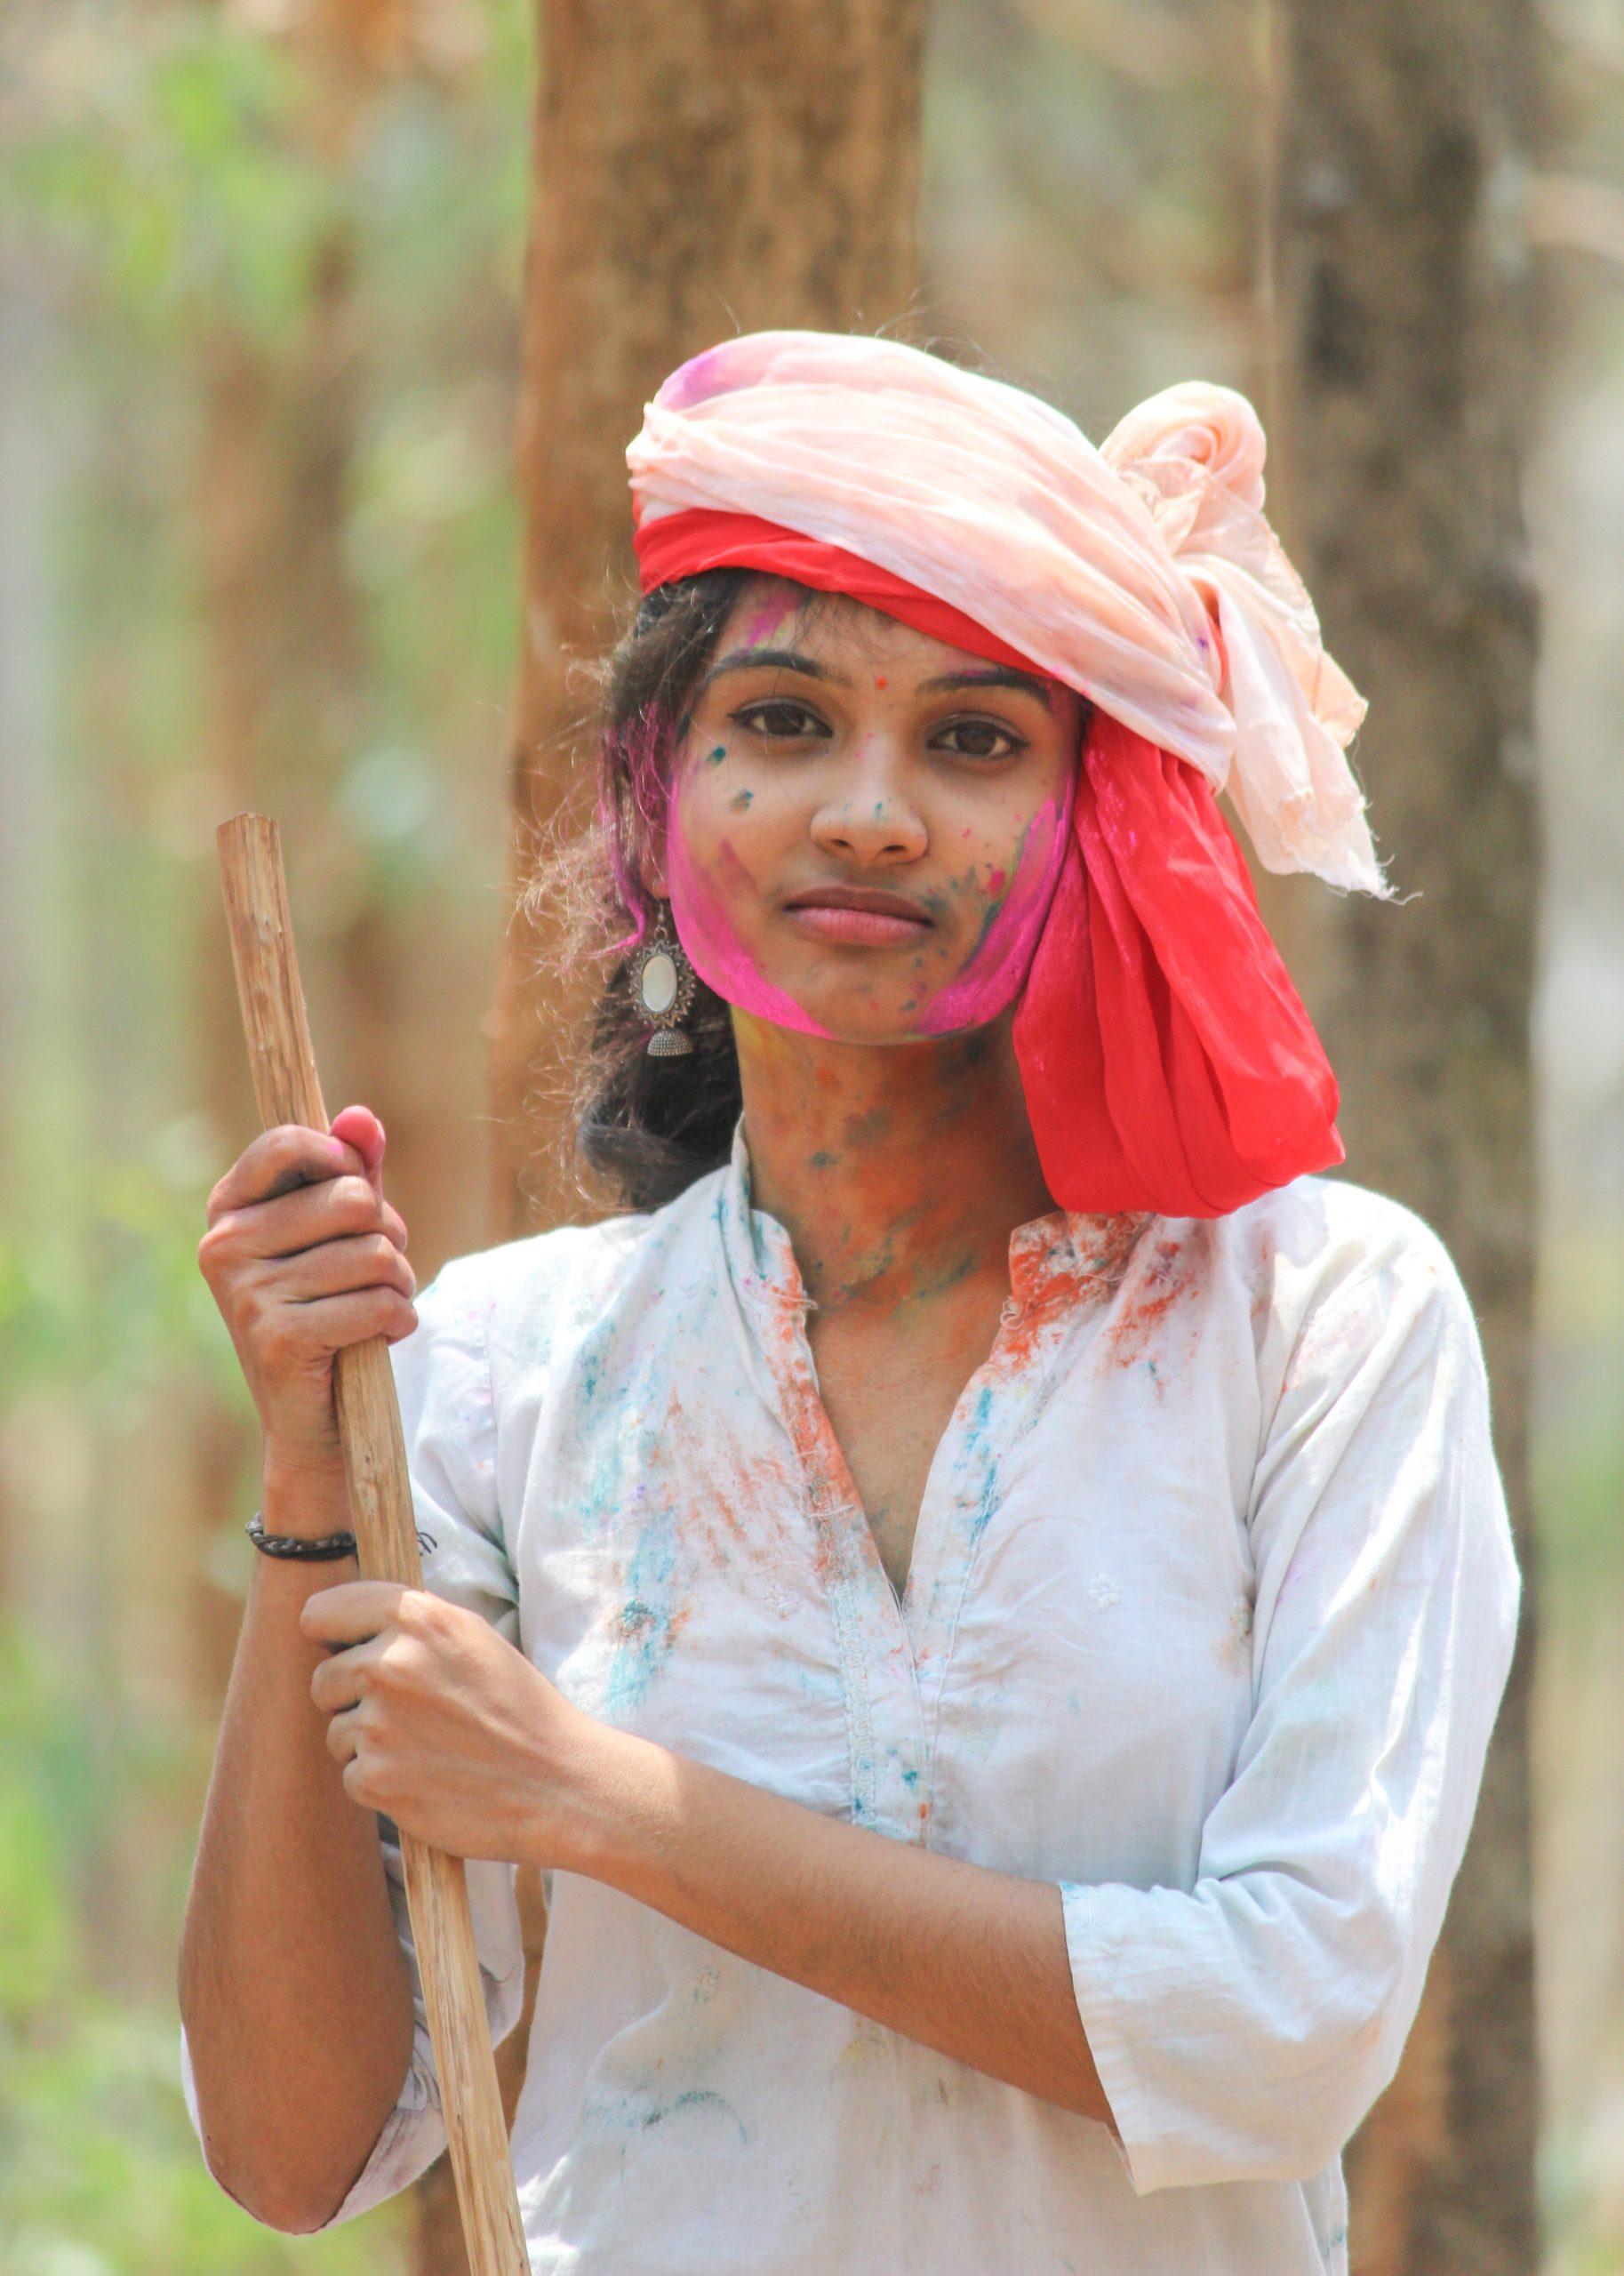 A village girl celebrating Holi festival